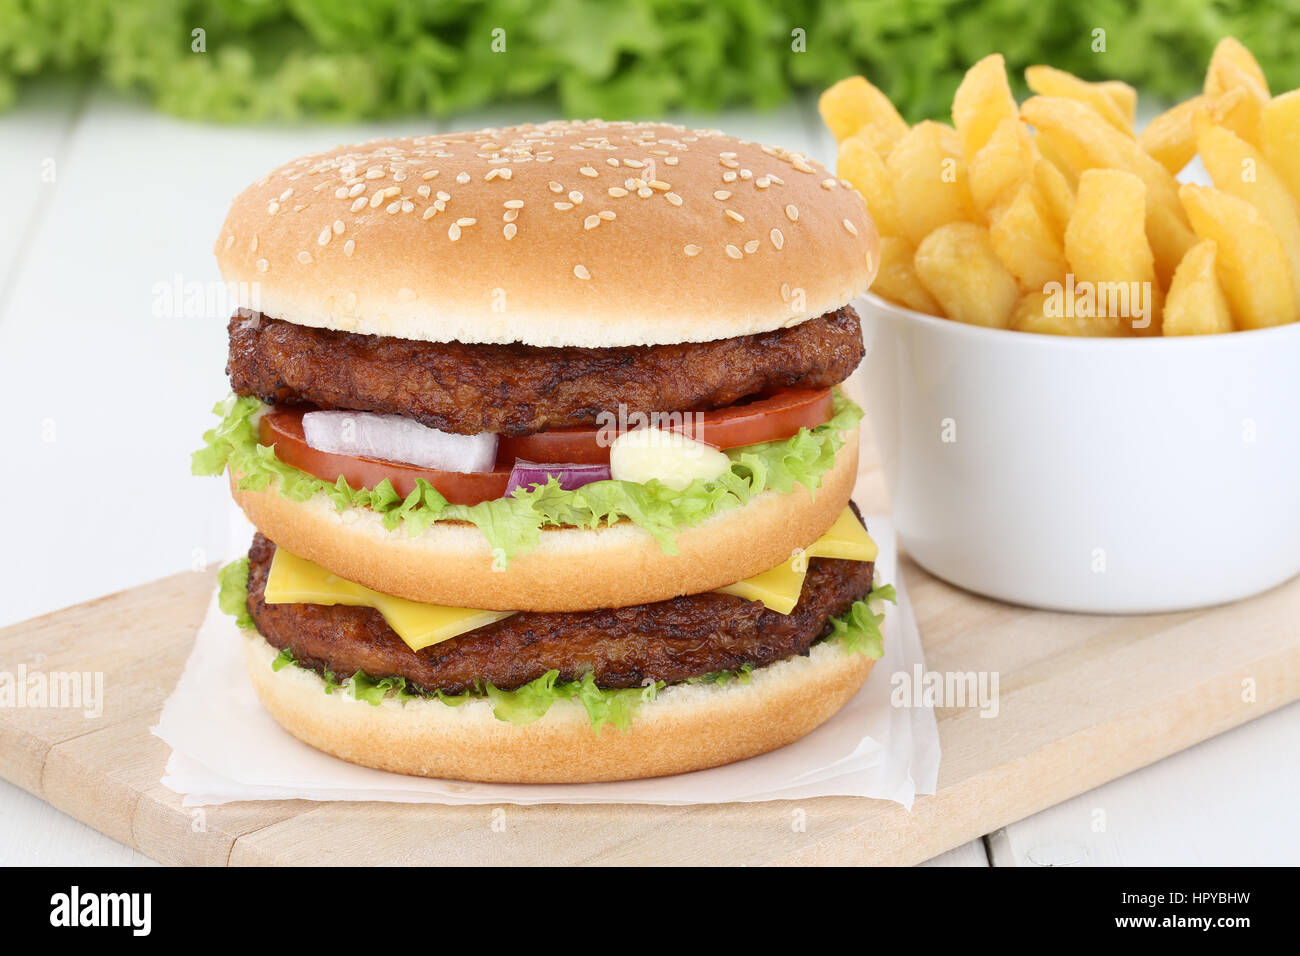 Doppel burger Hamburger mit Pommes frites Tomaten Salat Käse ungesund Stockbild